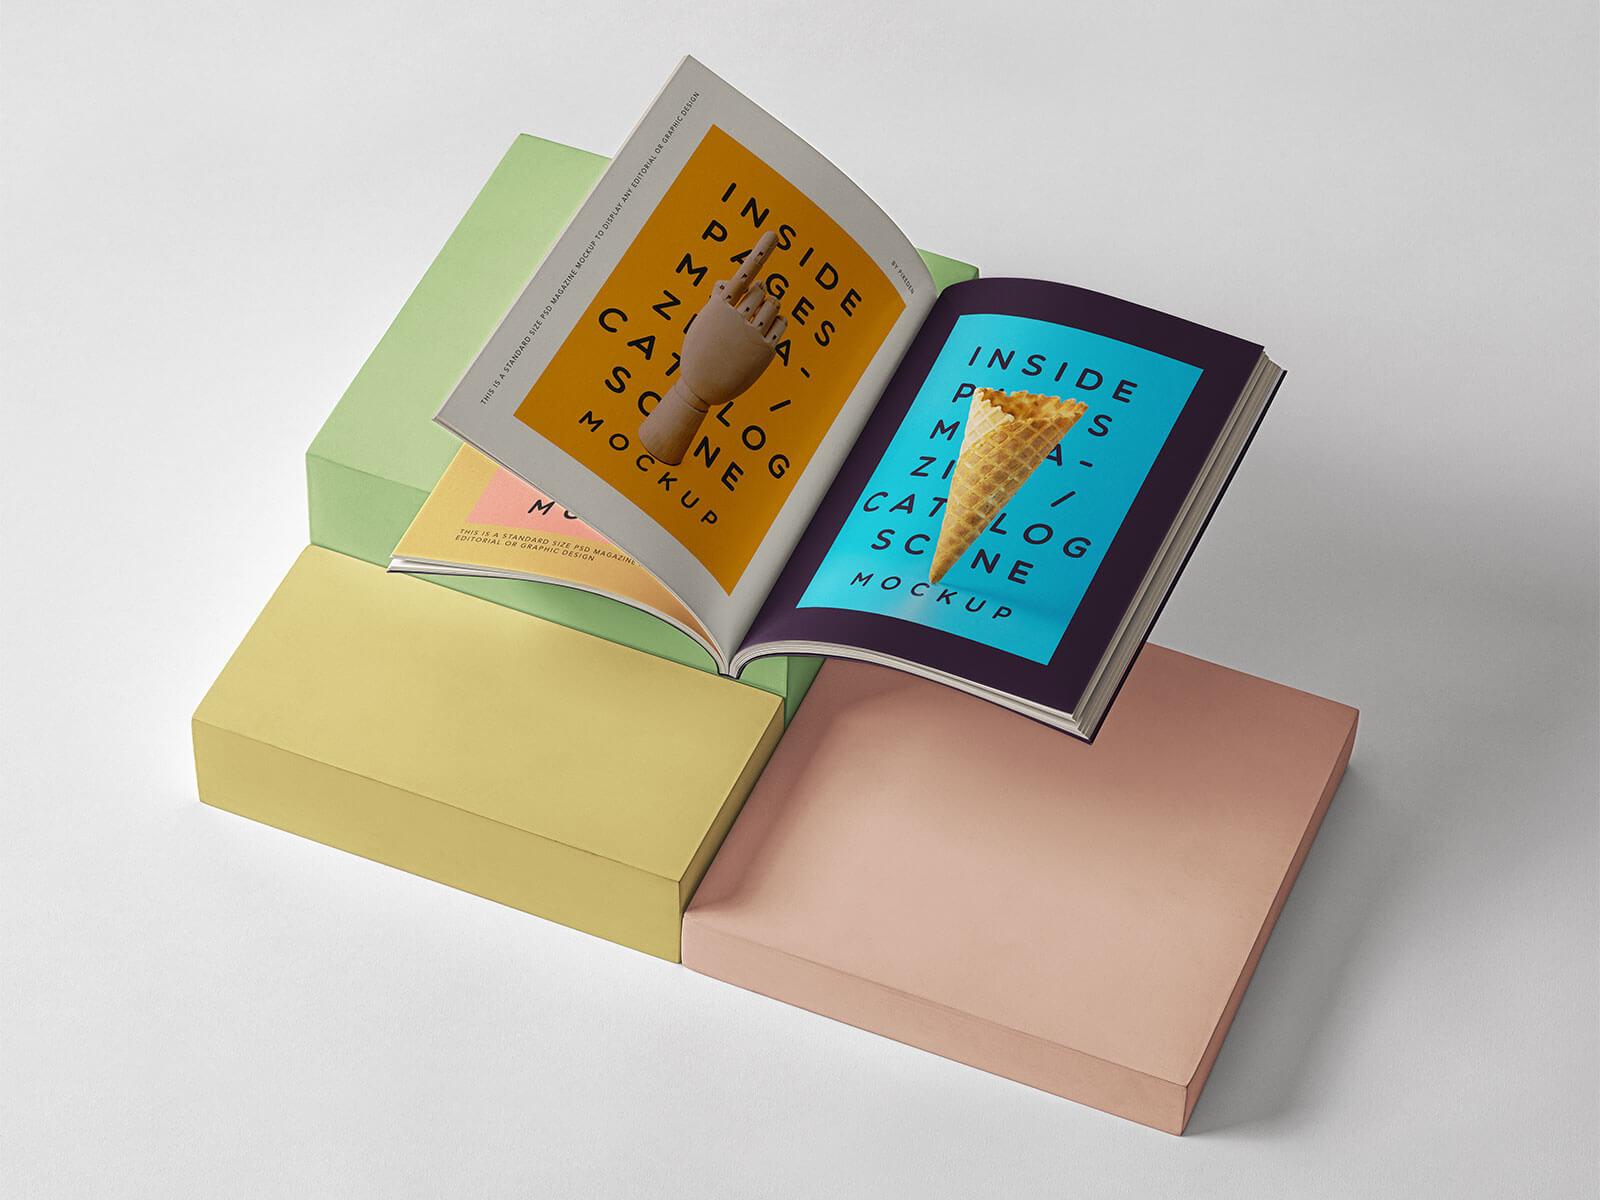 Inside-Magazine-Catalog-Presentation-Scene-Mockup